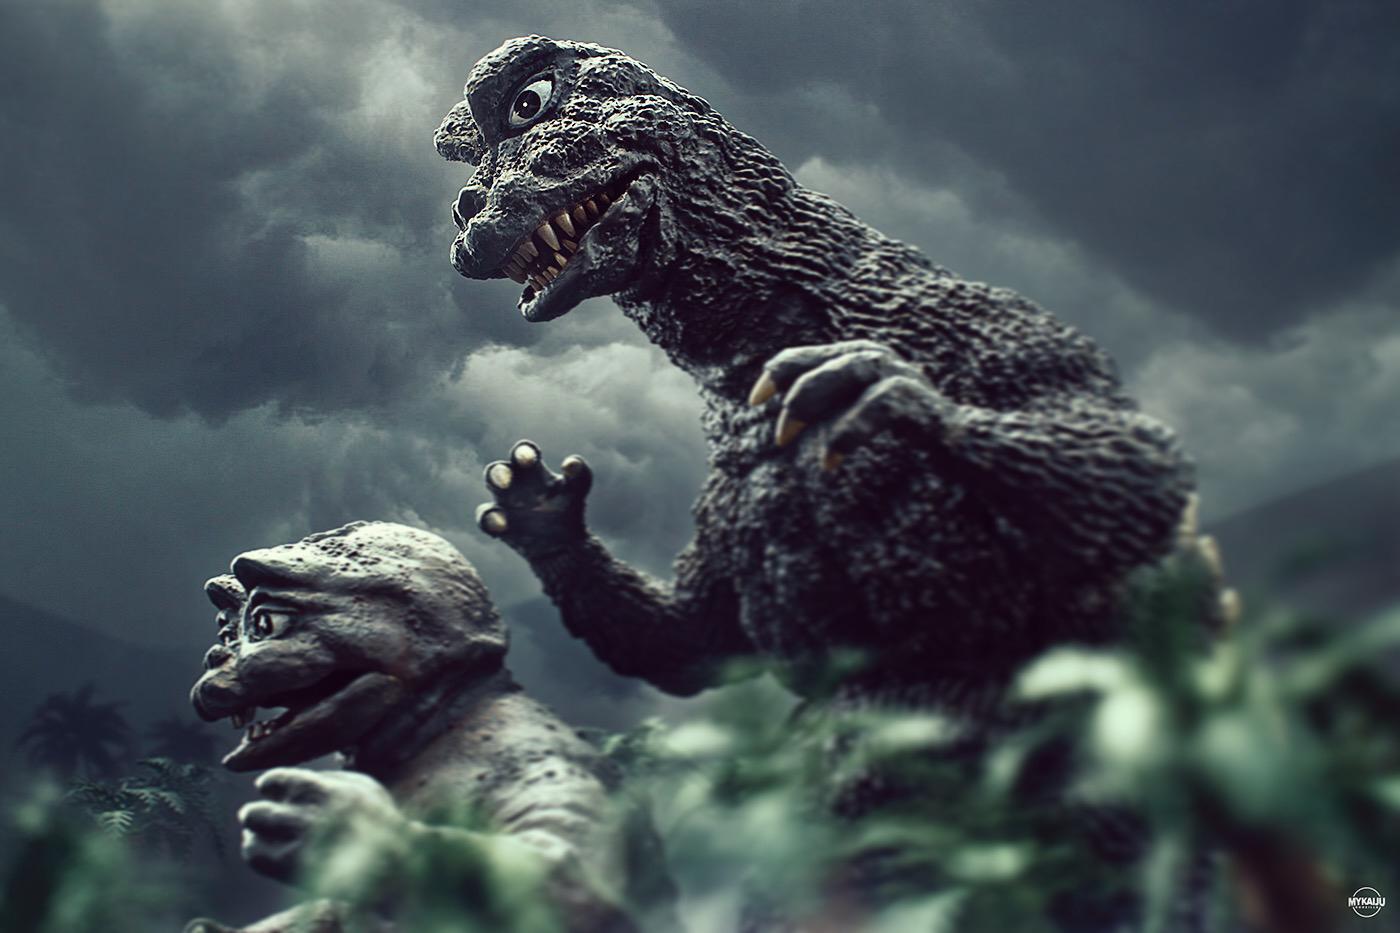 Godzilla and Minya